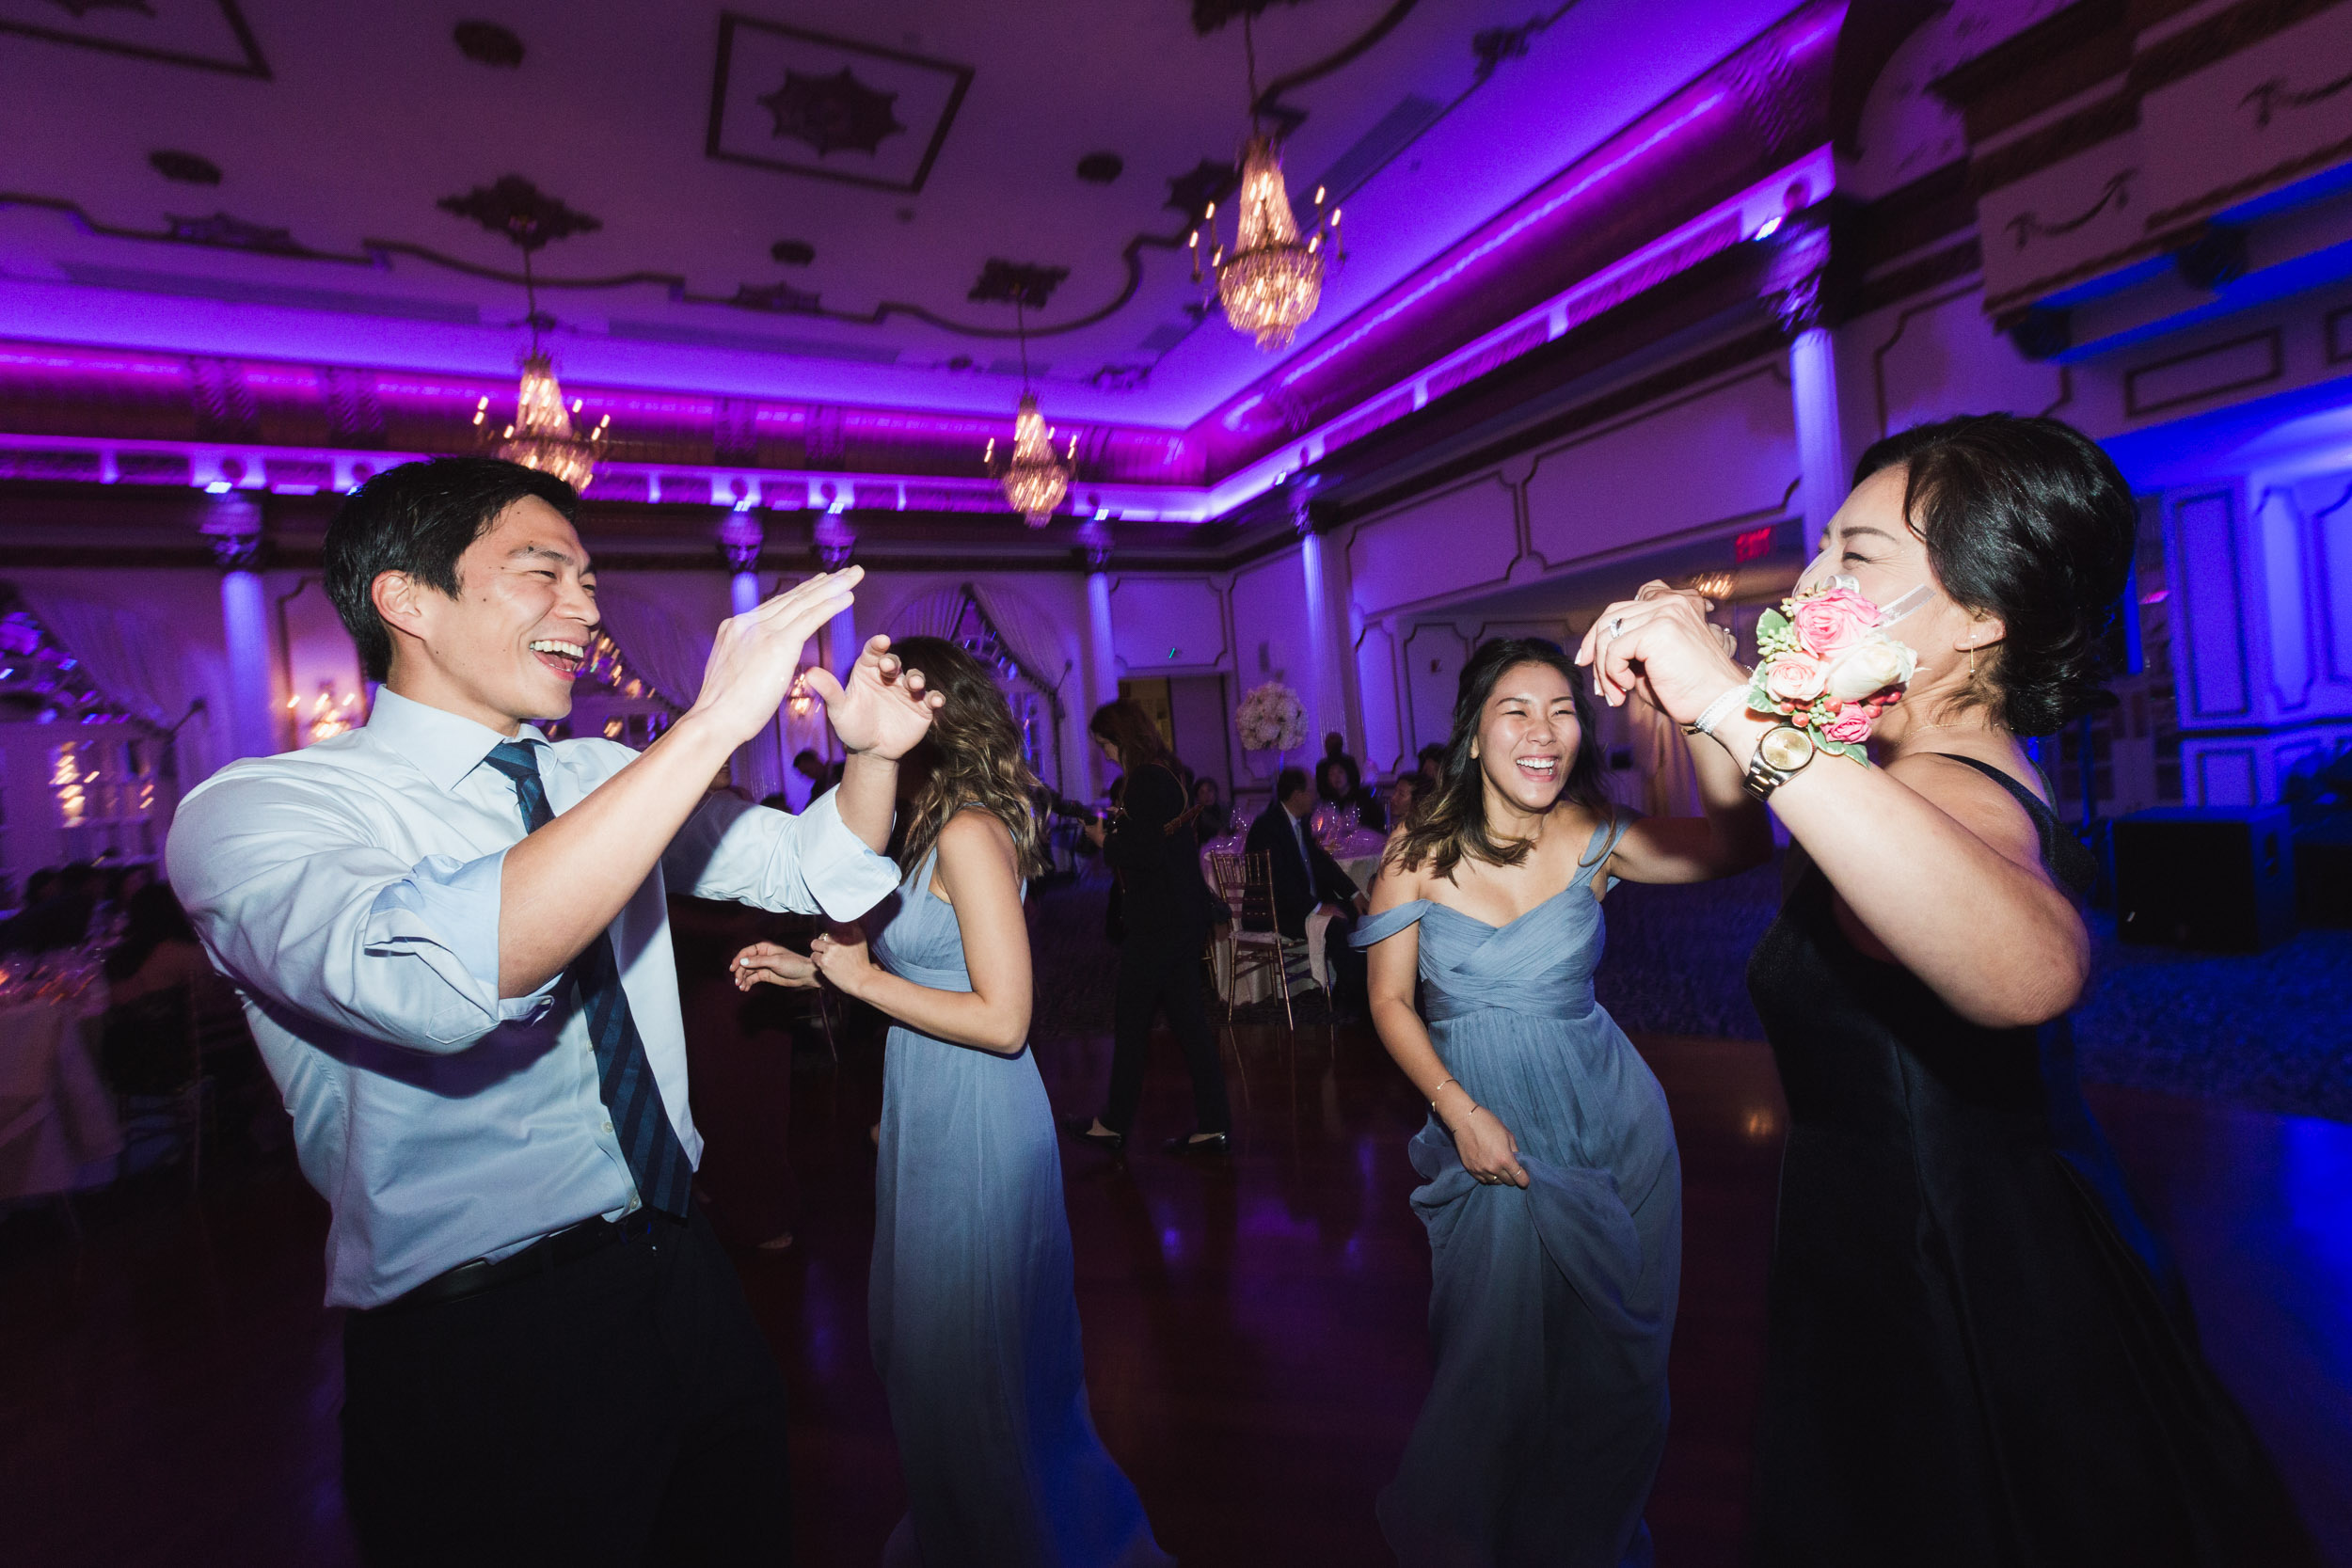 joyce-vincent-wedding-0025.jpg